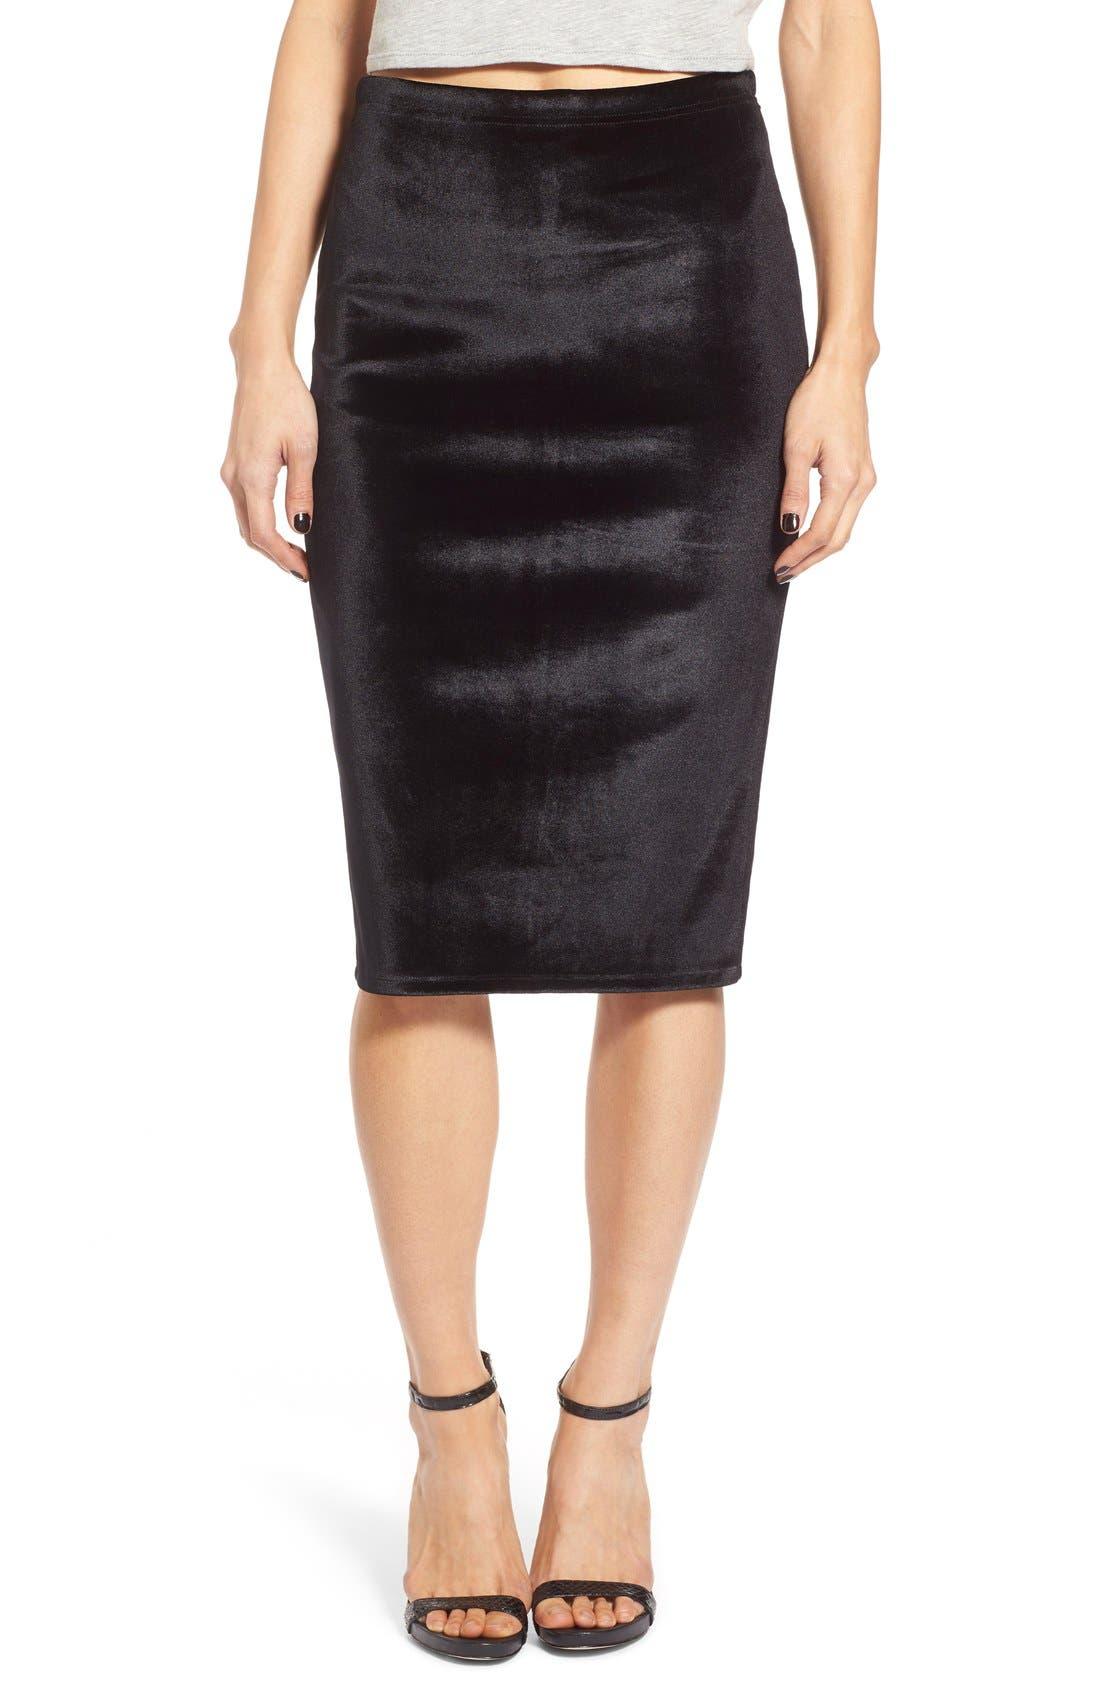 LEITH,                             Velour Pencil Skirt,                             Main thumbnail 1, color,                             001